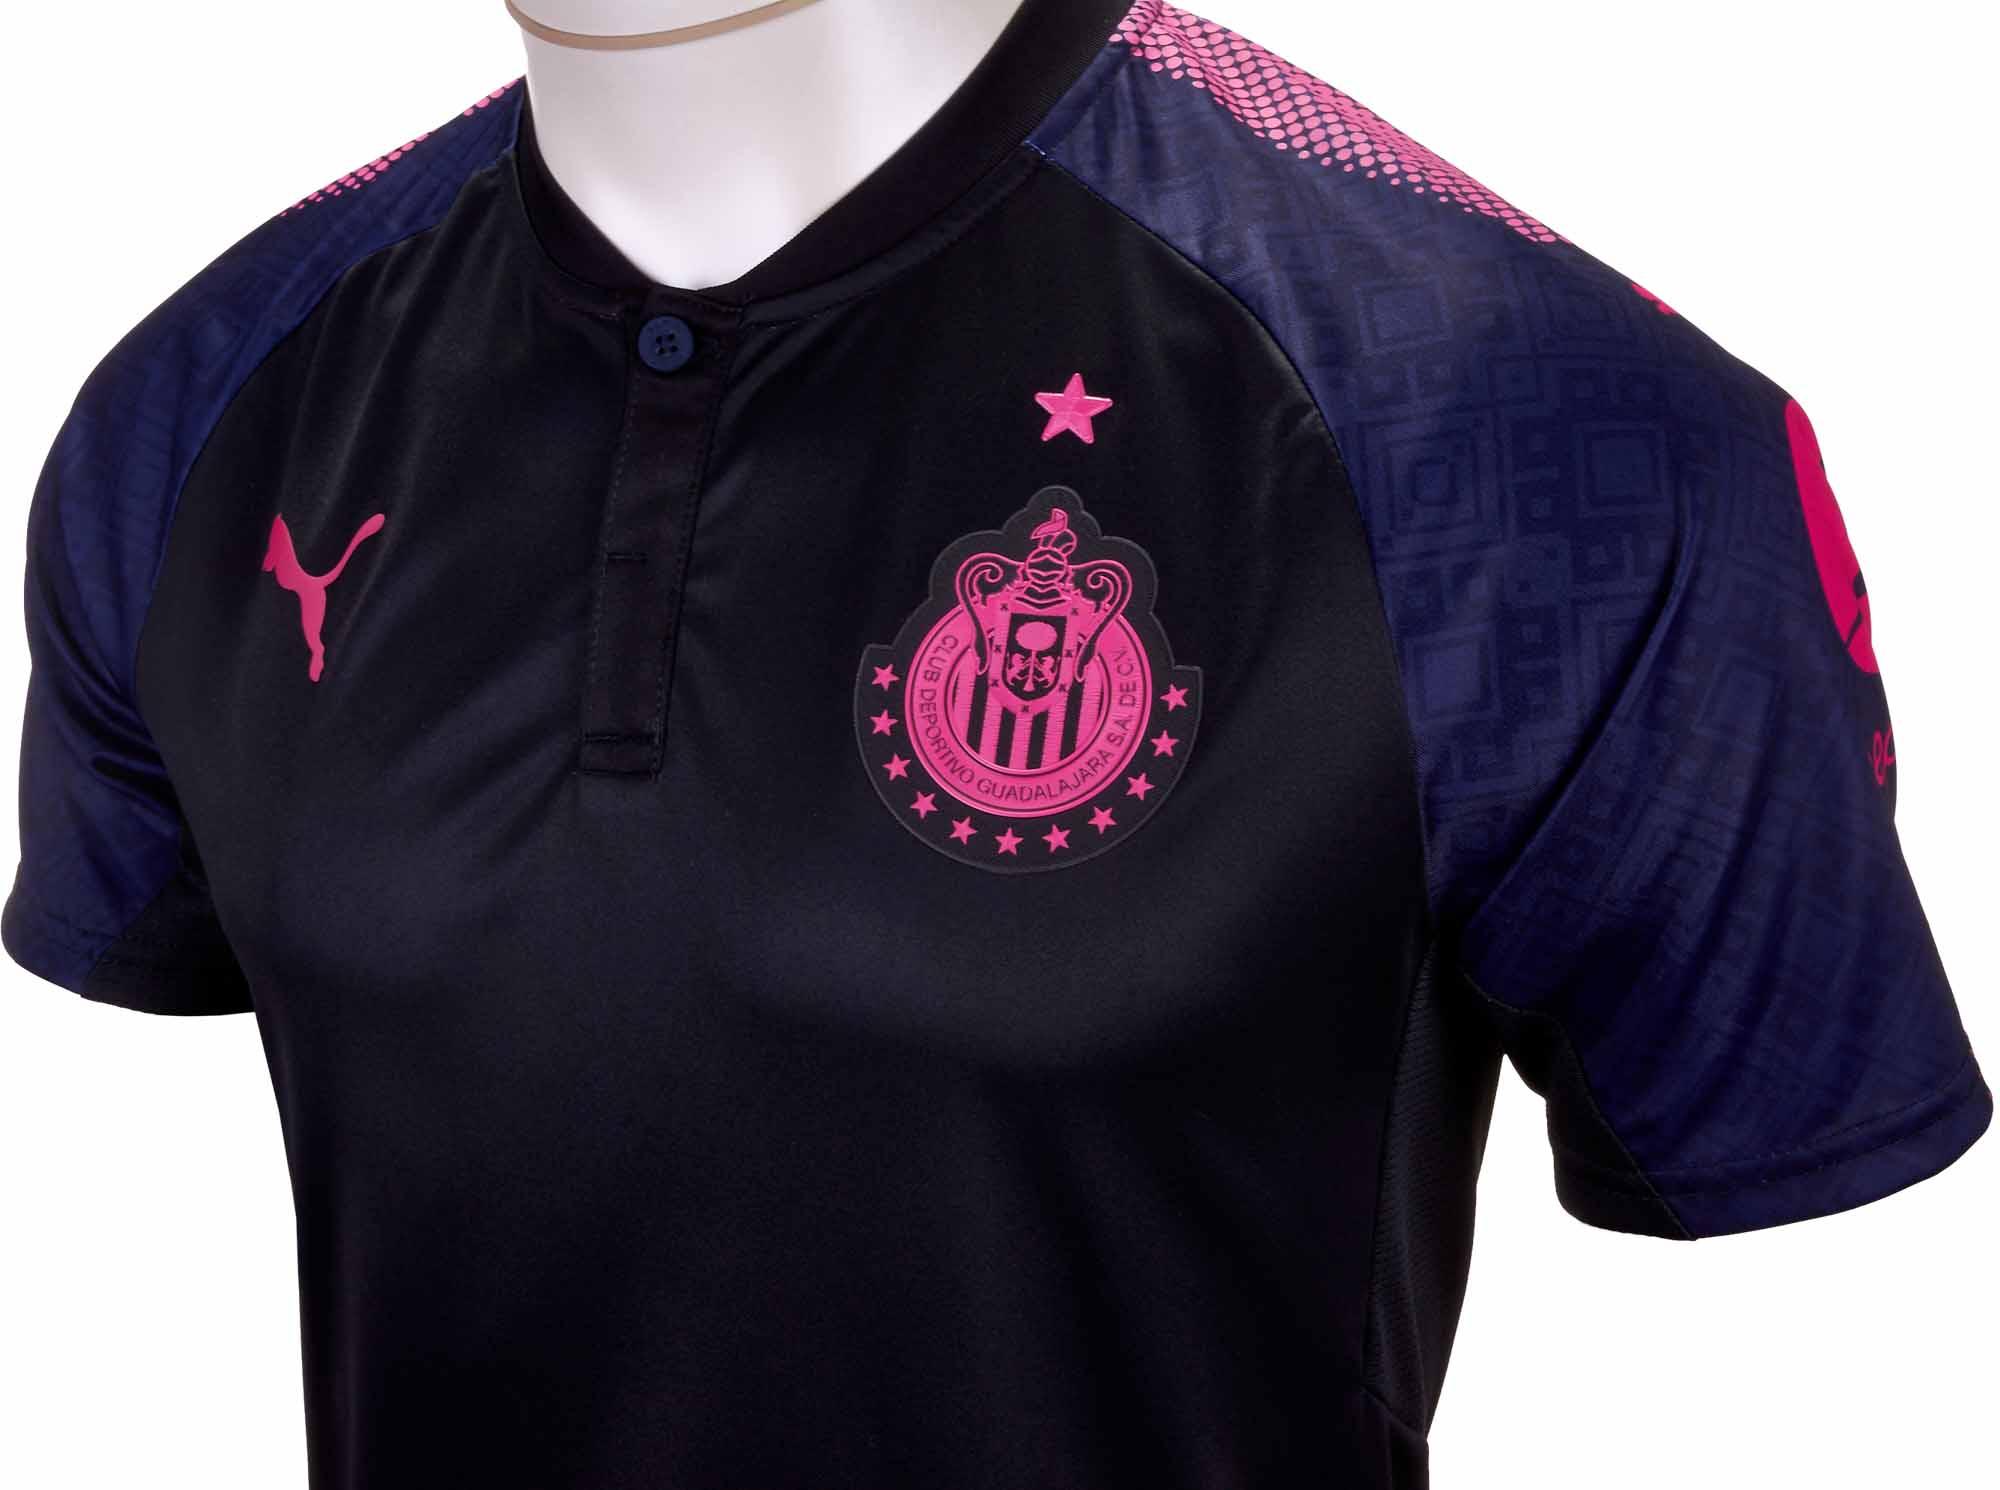 wholesale dealer 866c8 62bcb 2017 Puma Chivas Limited Edition Jersey - SoccerPro.com